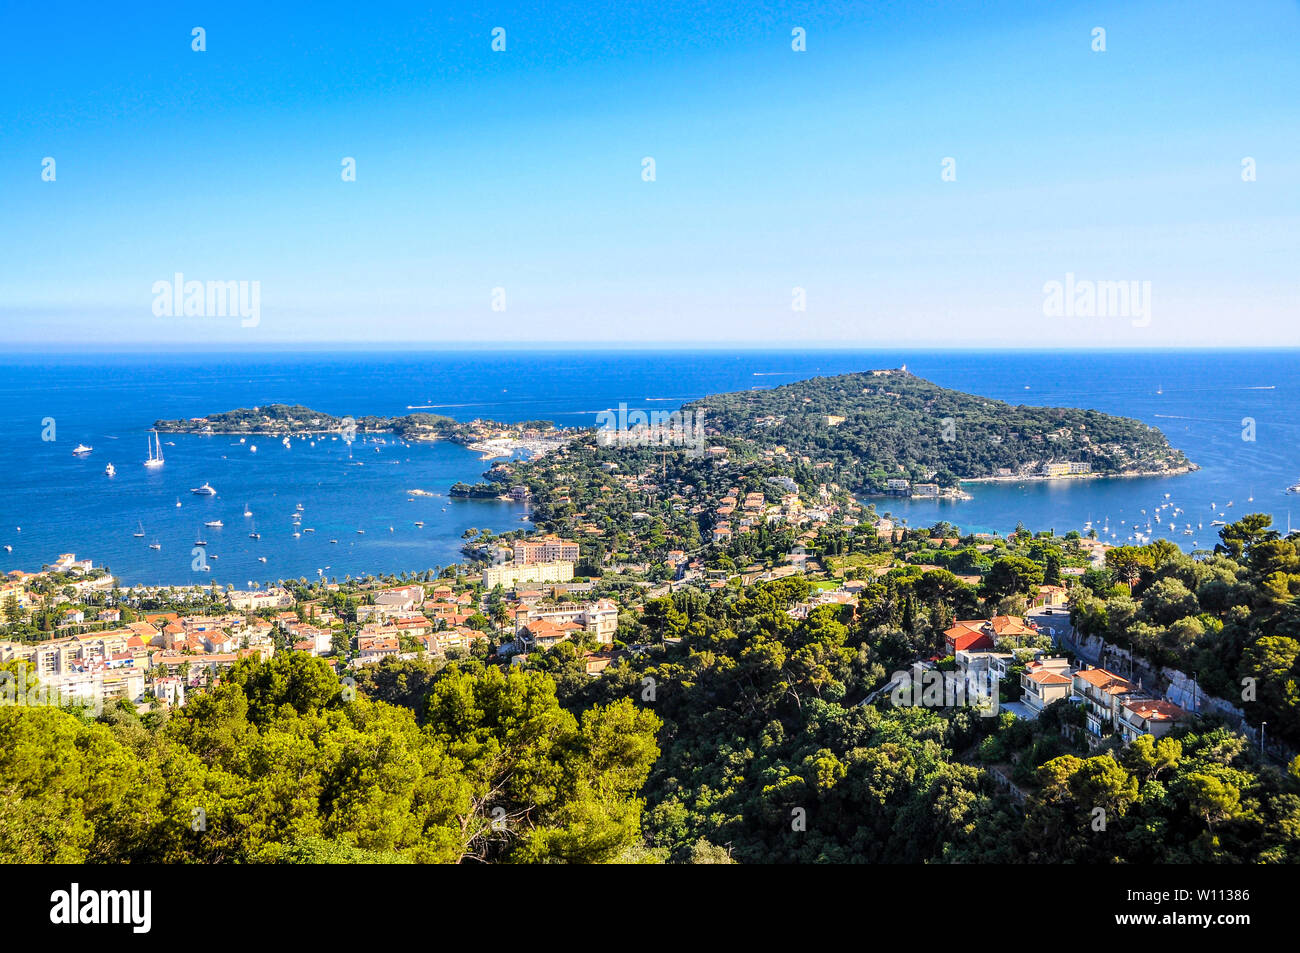 Saint-Jean-Cap-Ferrat nearby Nice, Nizza, Villa Rothschild. Aerial Postcard view. Cote de azur d'azur, french riviera, Provence, France. - Stock Image